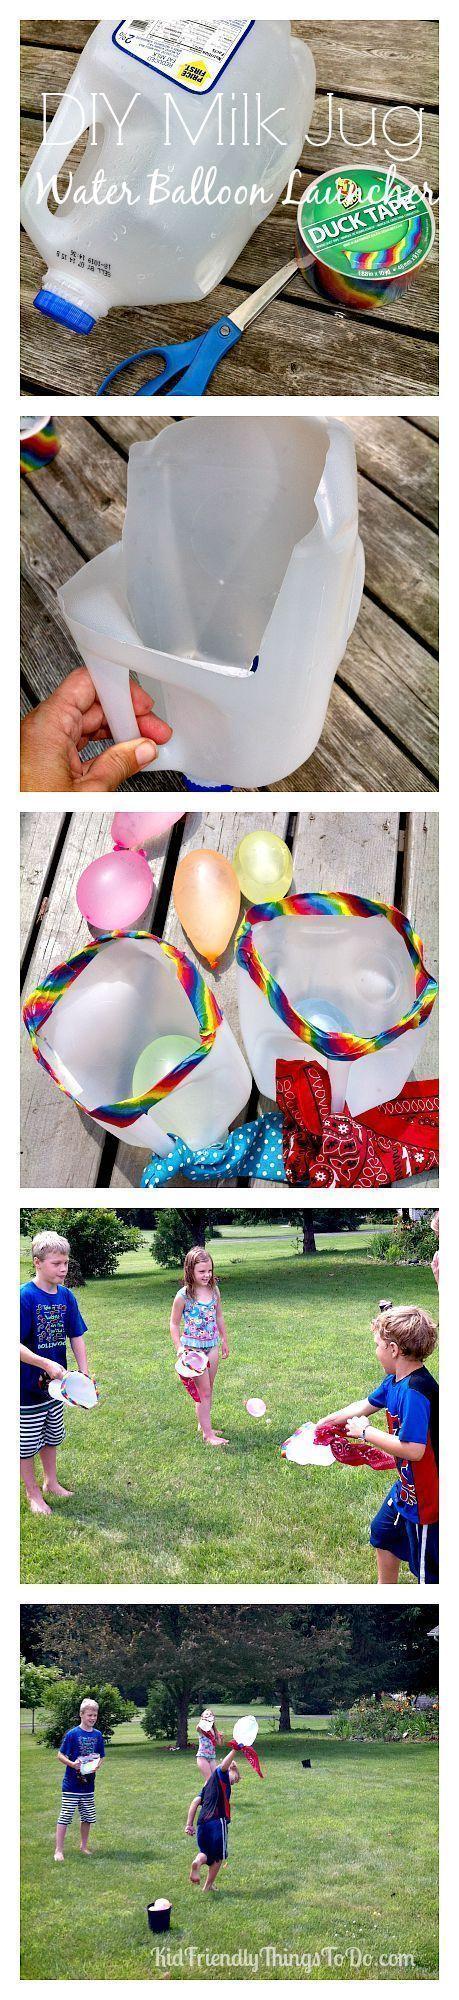 Amazing race ideas - Diy Milk Jug Water Balloon Launch Outdoor Summer Game For Kids